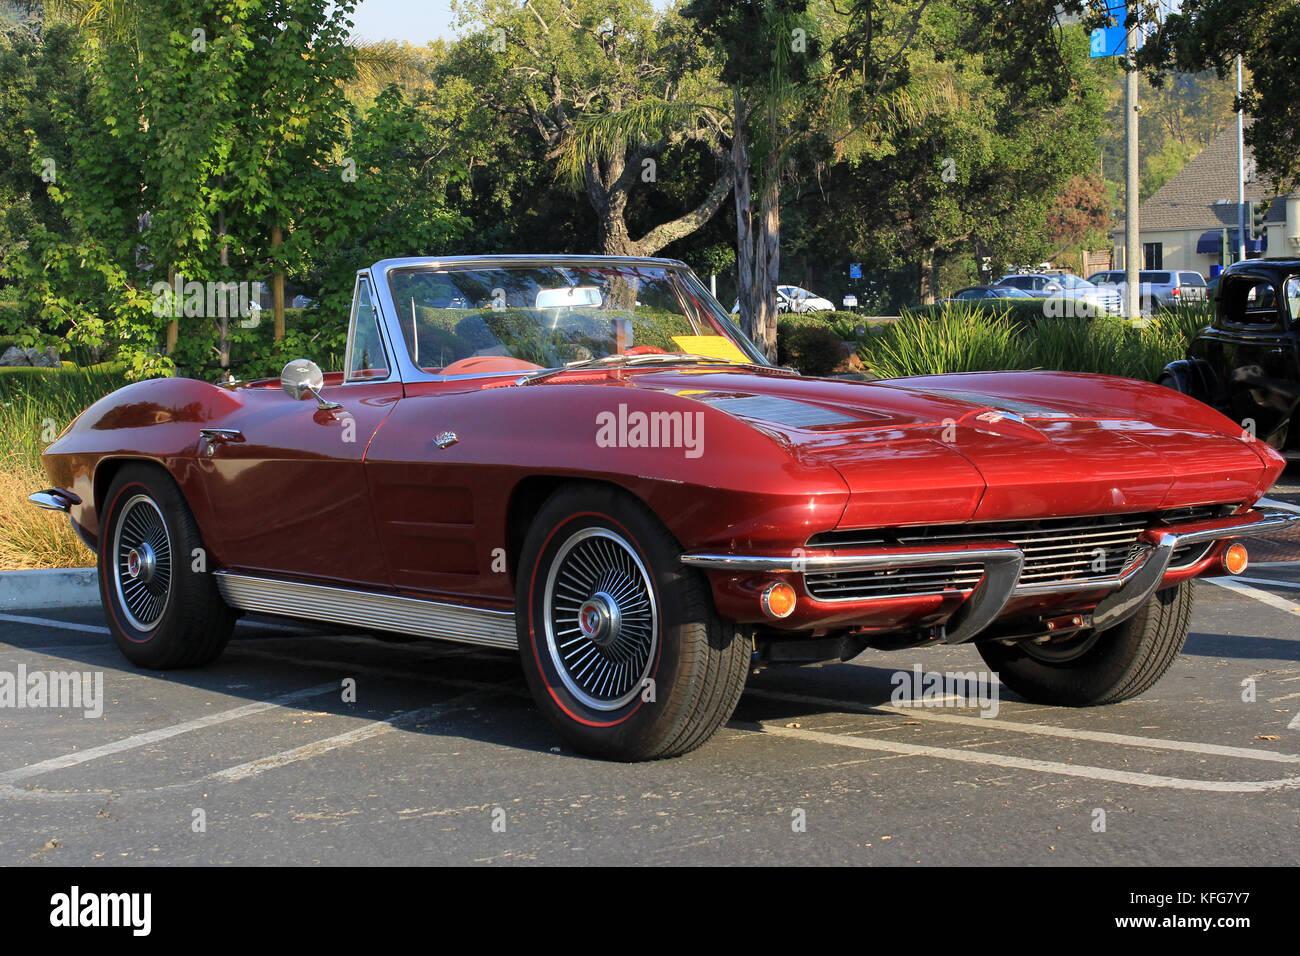 1963 corvette stingray Stock Photo: 164470635 - Alamy